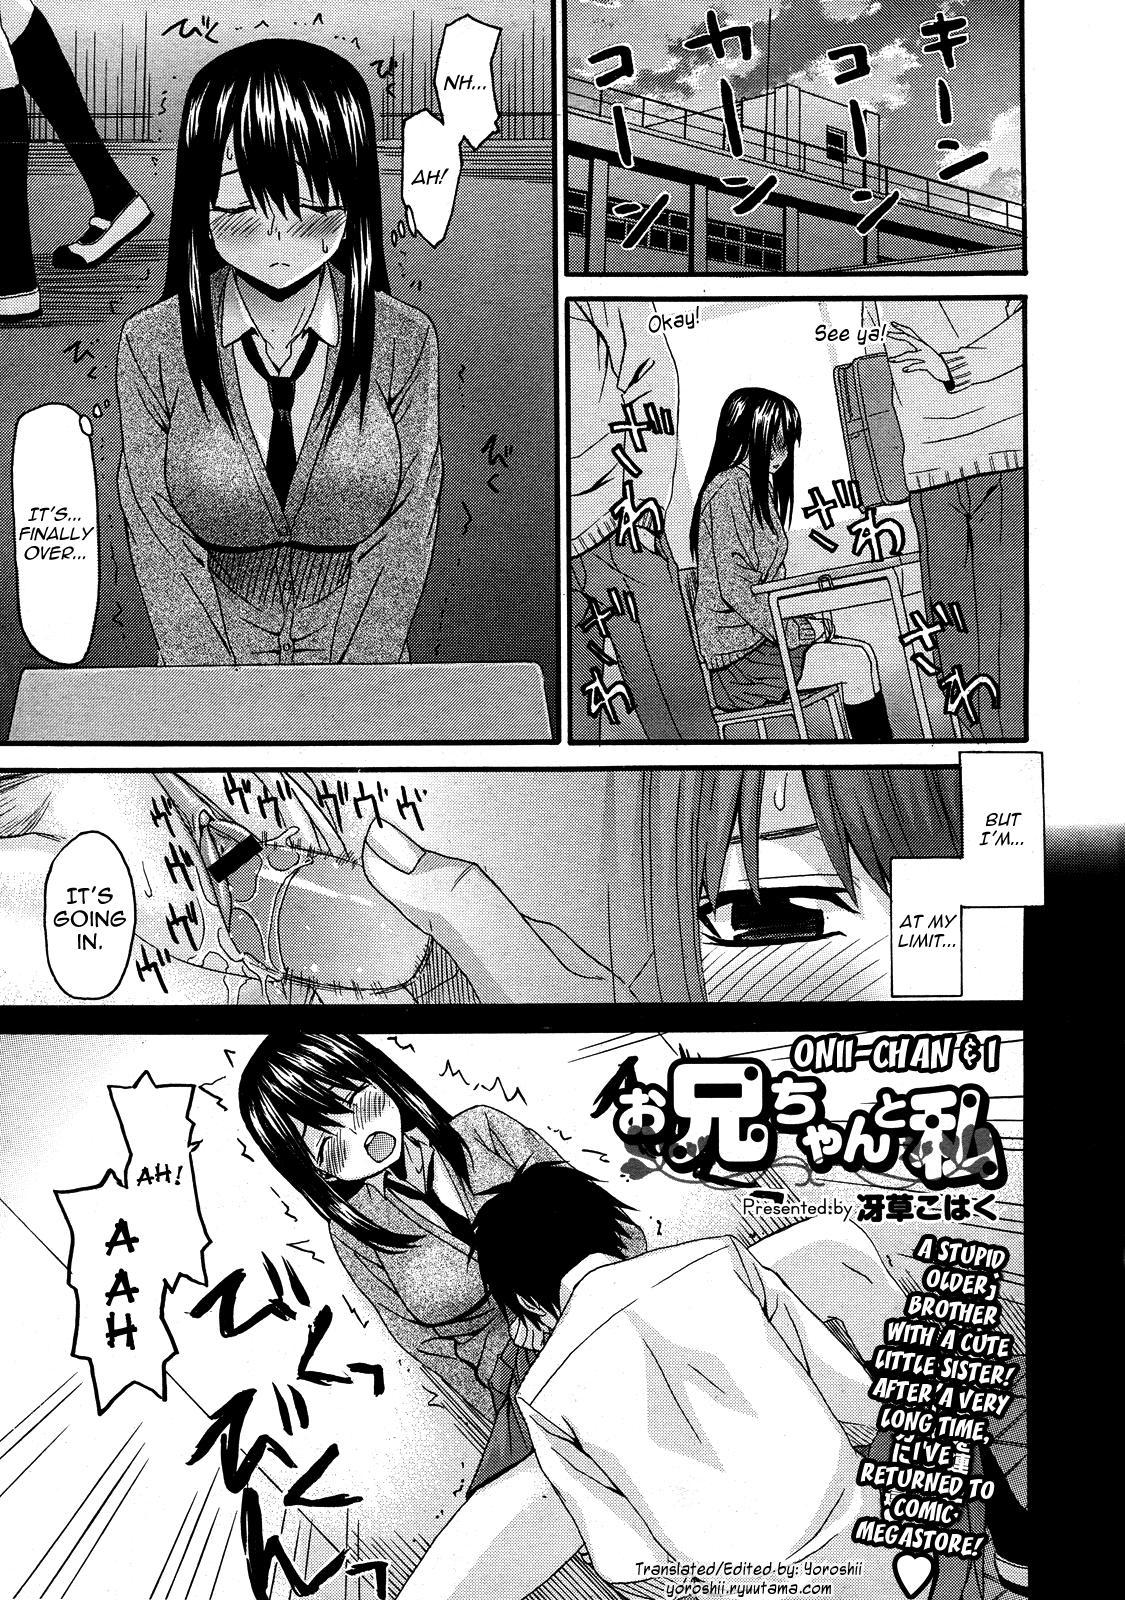 [Saegusa Kohaku] Onii-chan to Watashi | Onii-chan & I (COMIC Megastore 2011-12) [ENG] [Yoroshii] 0